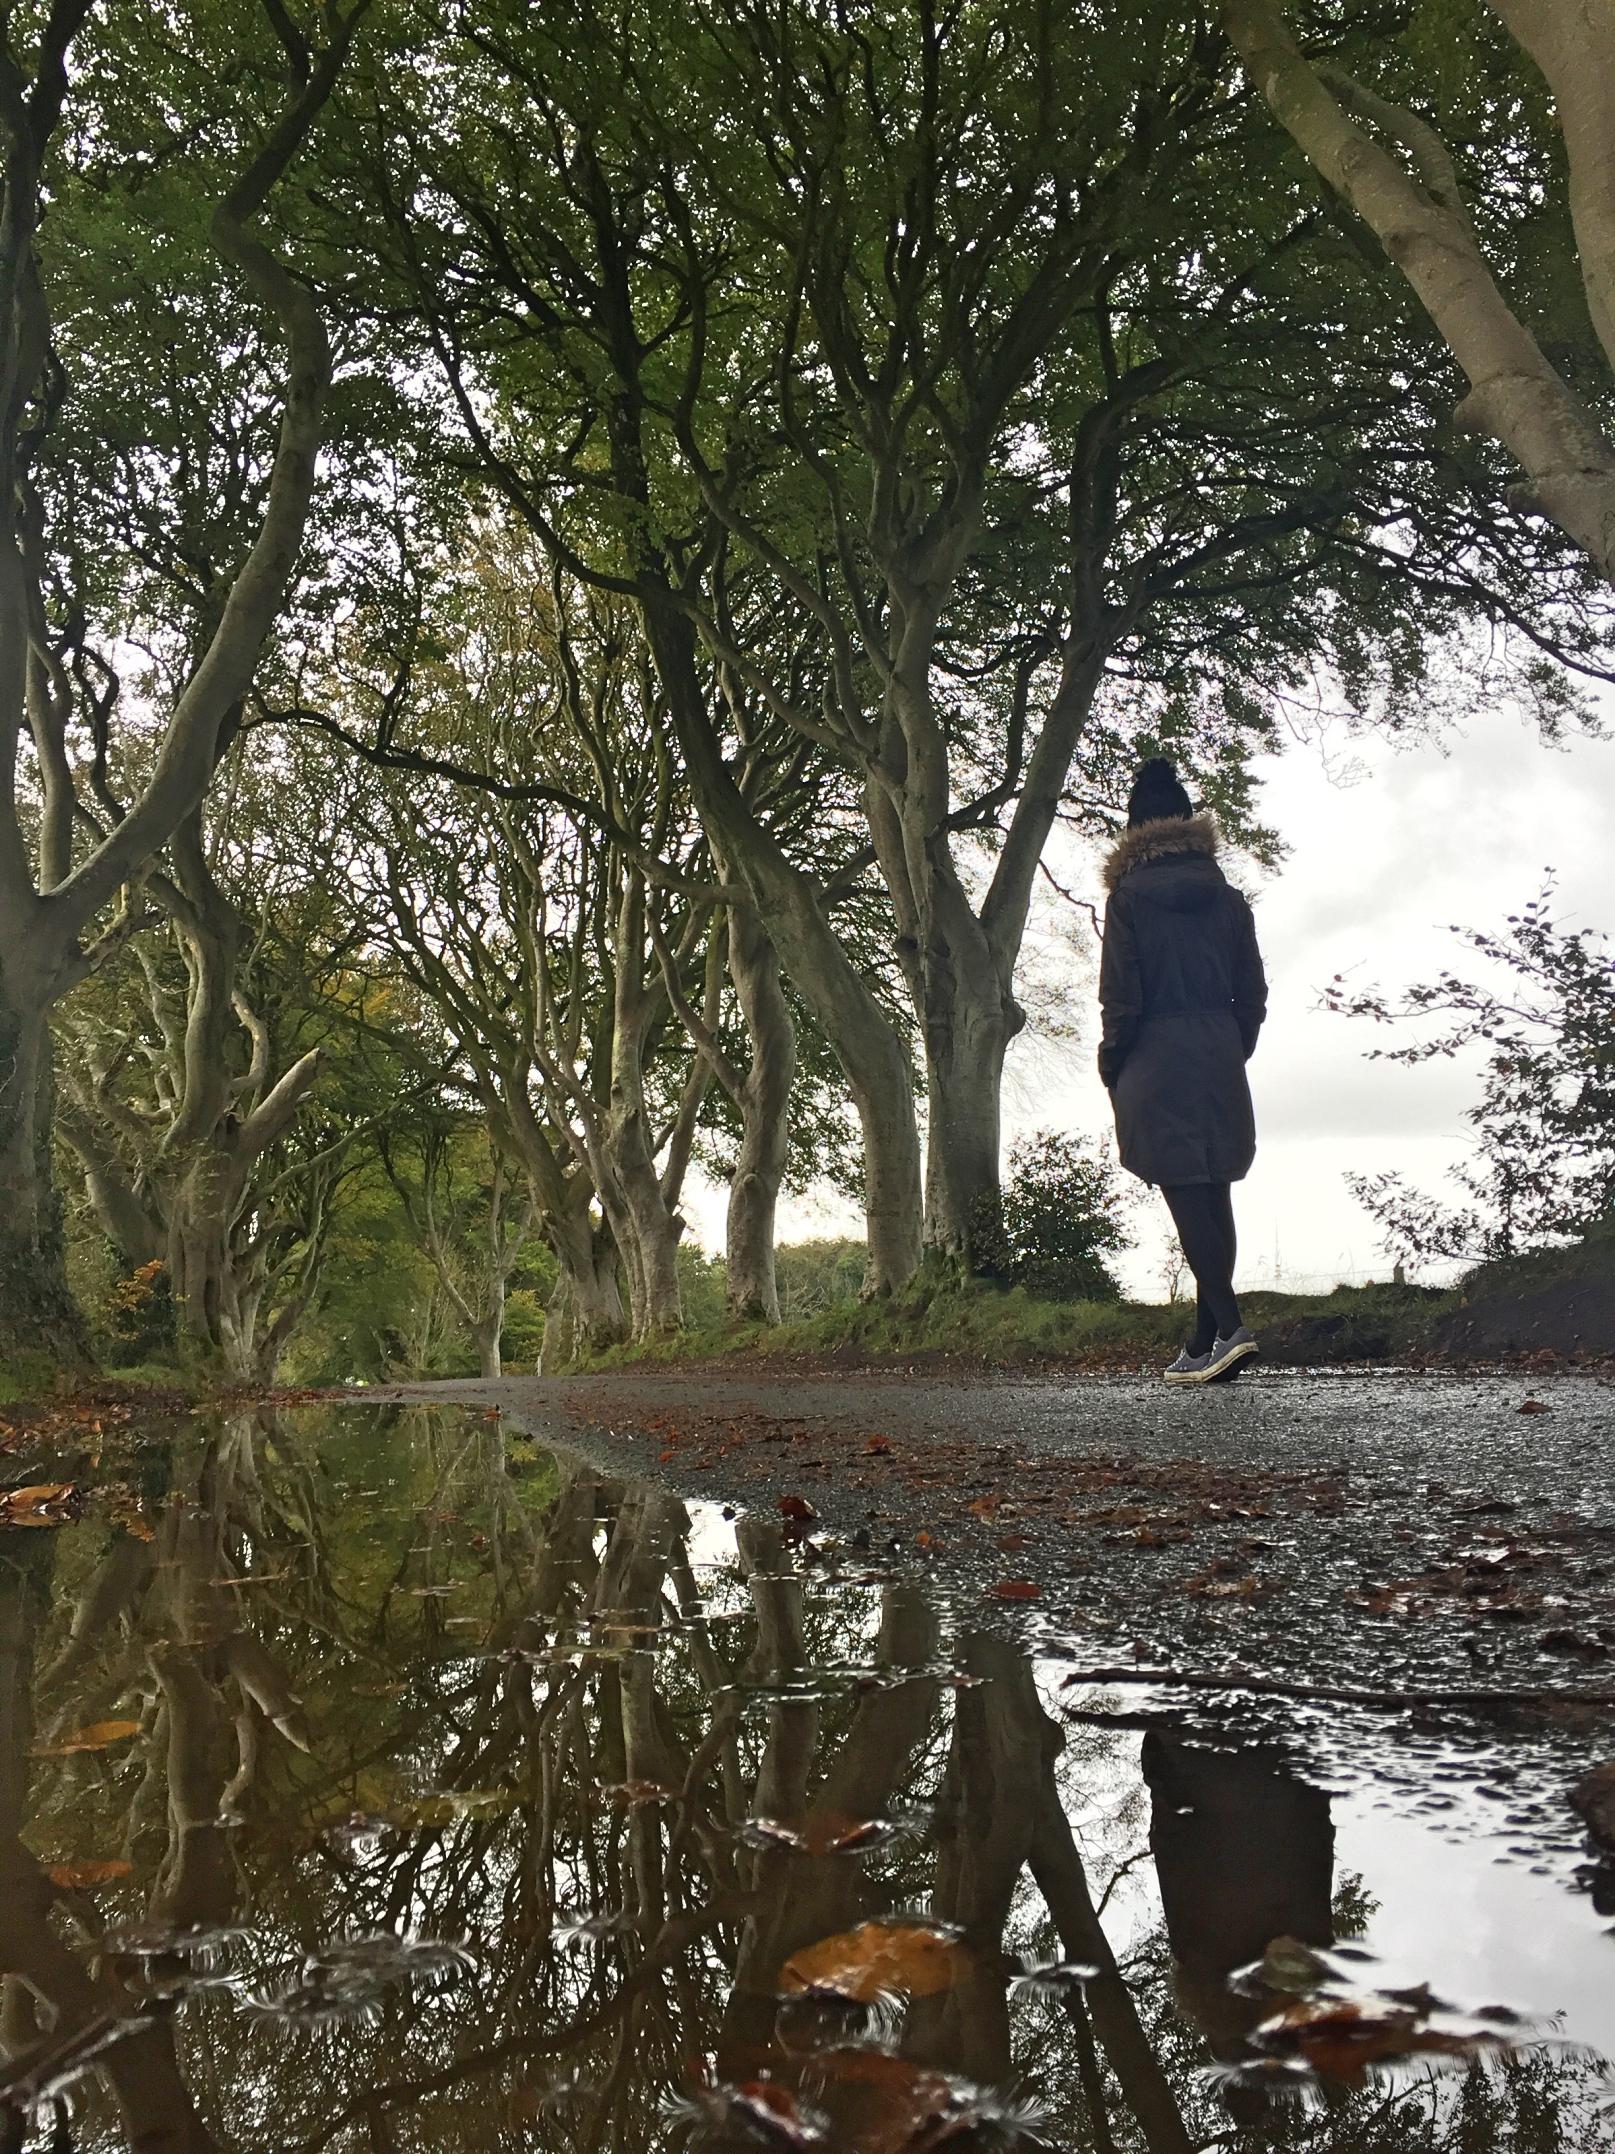 dark_hedges_darkhedges_northern_ireland_niexplorer_ni_explorer (1).jpg